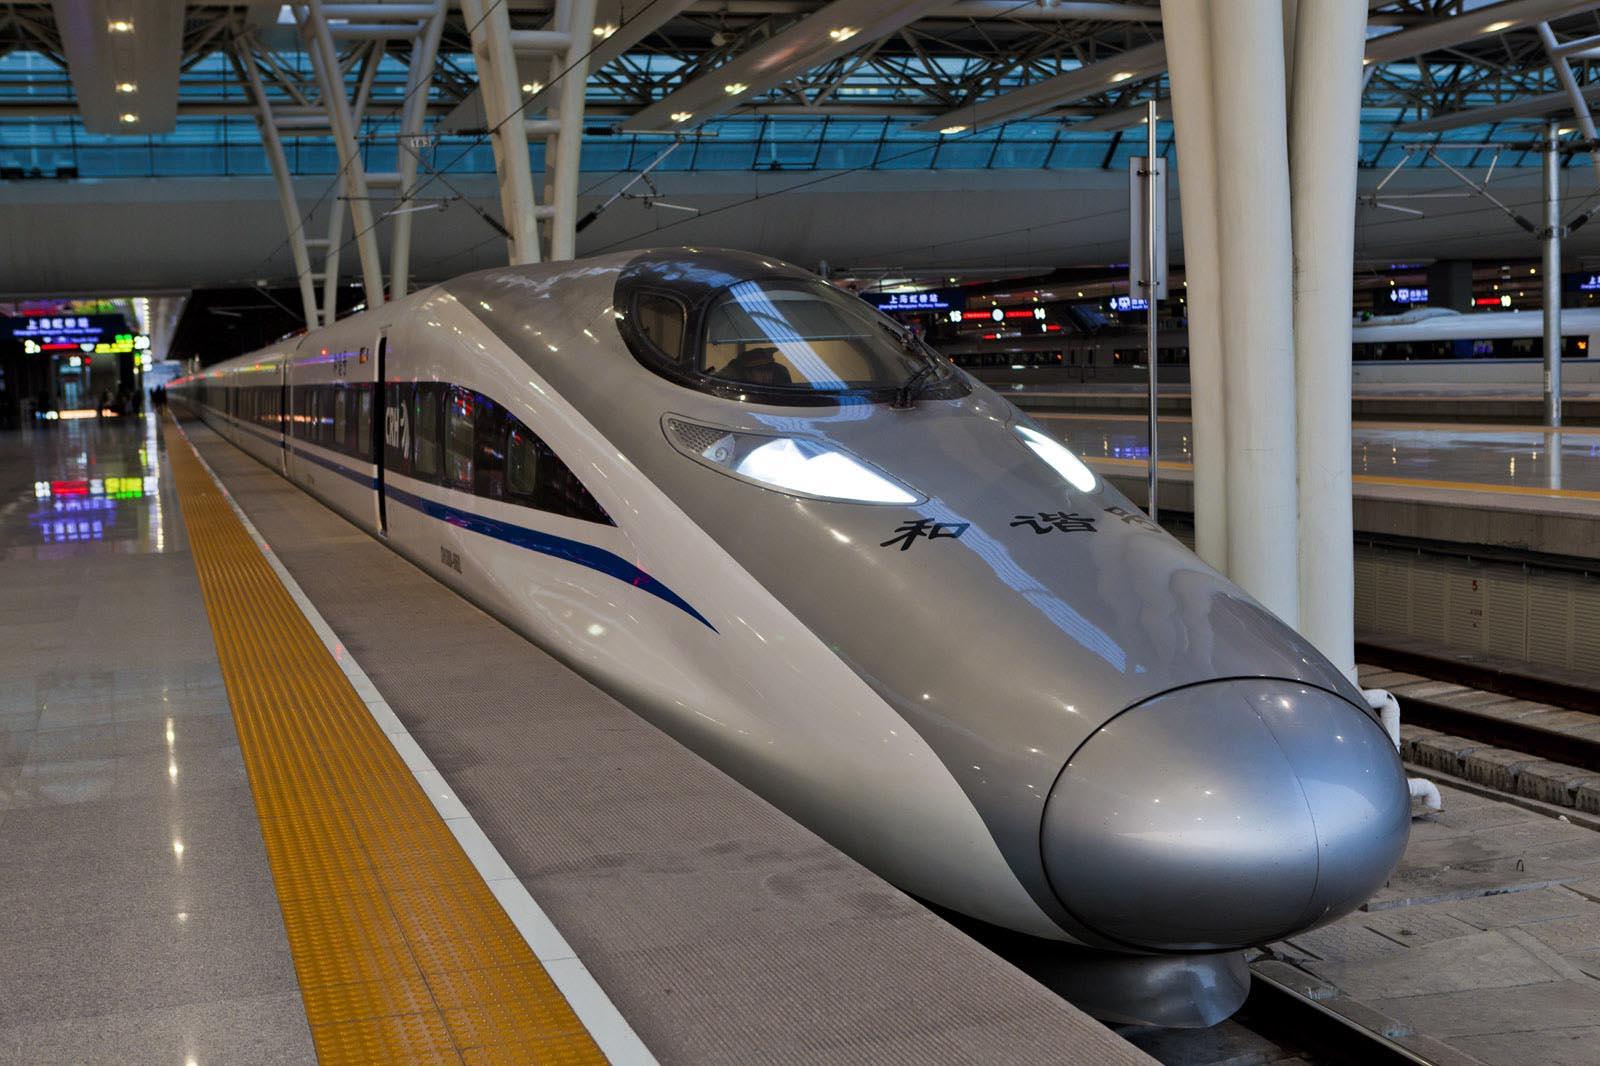 CRH380AL China high-speed train